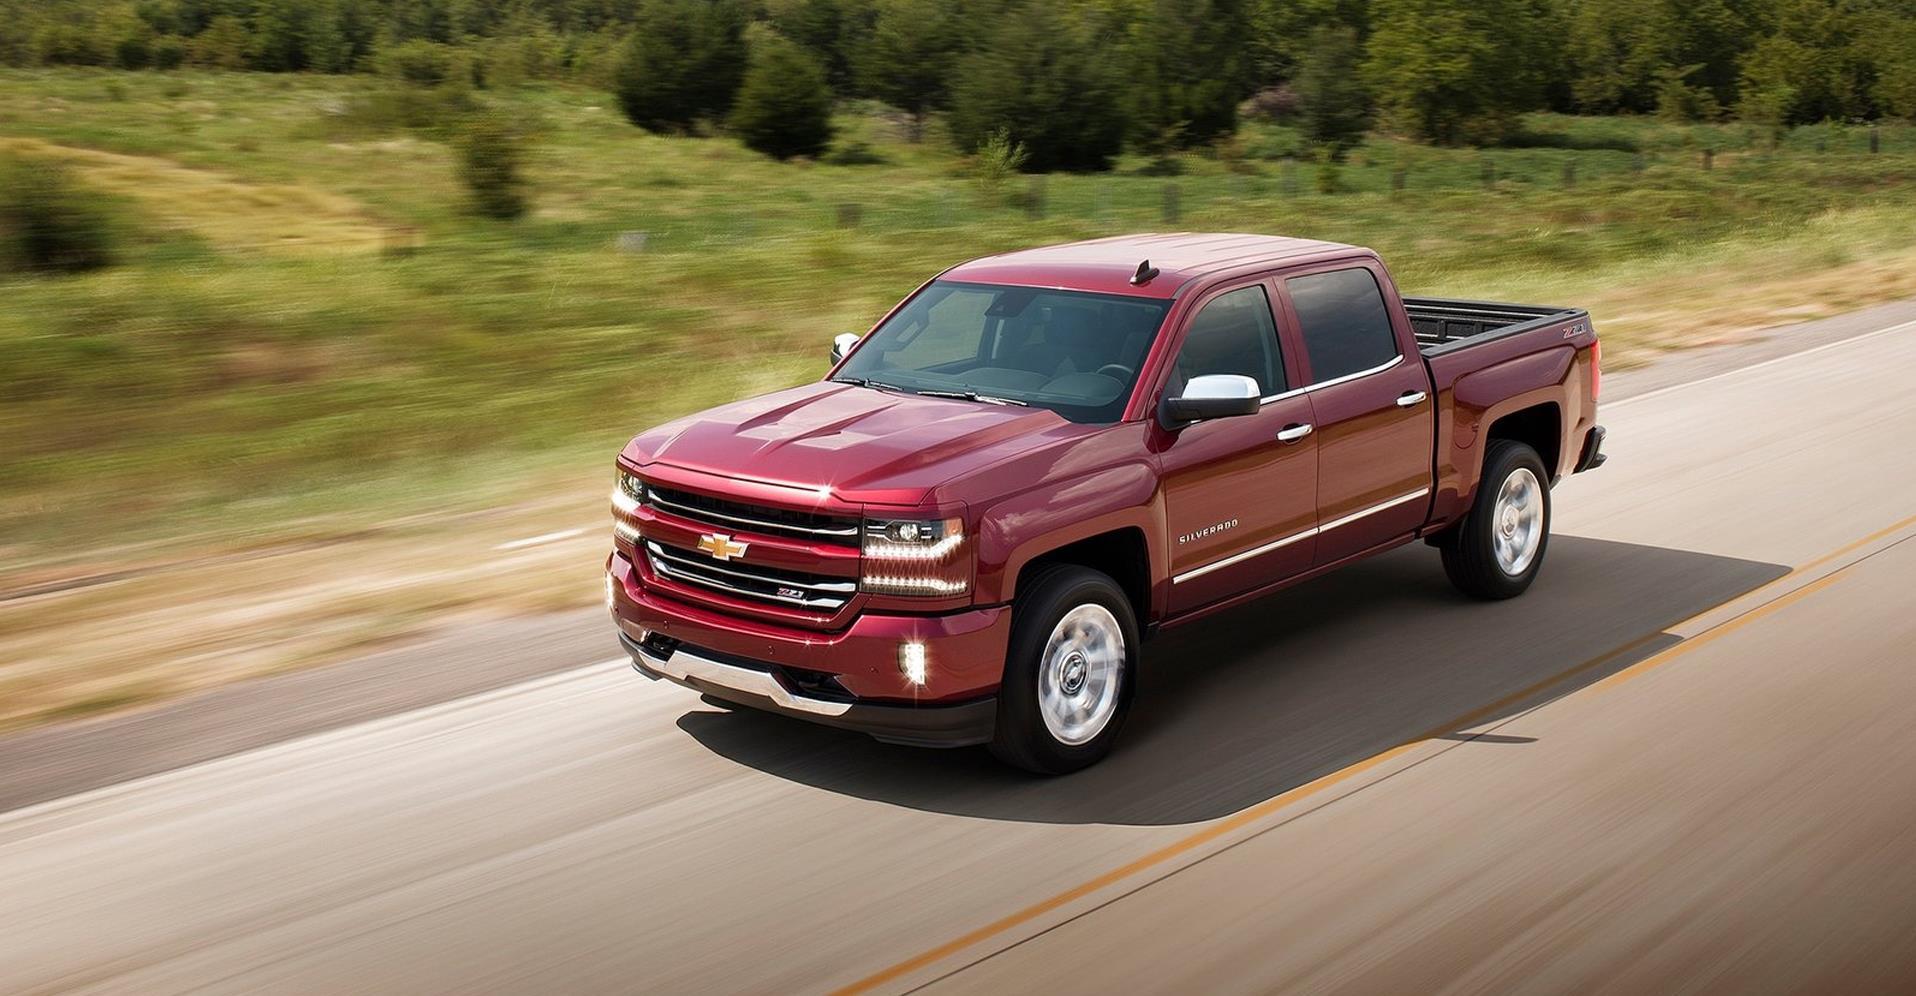 Mccurry motors athens huntsville athens al new used cars trucks sales service